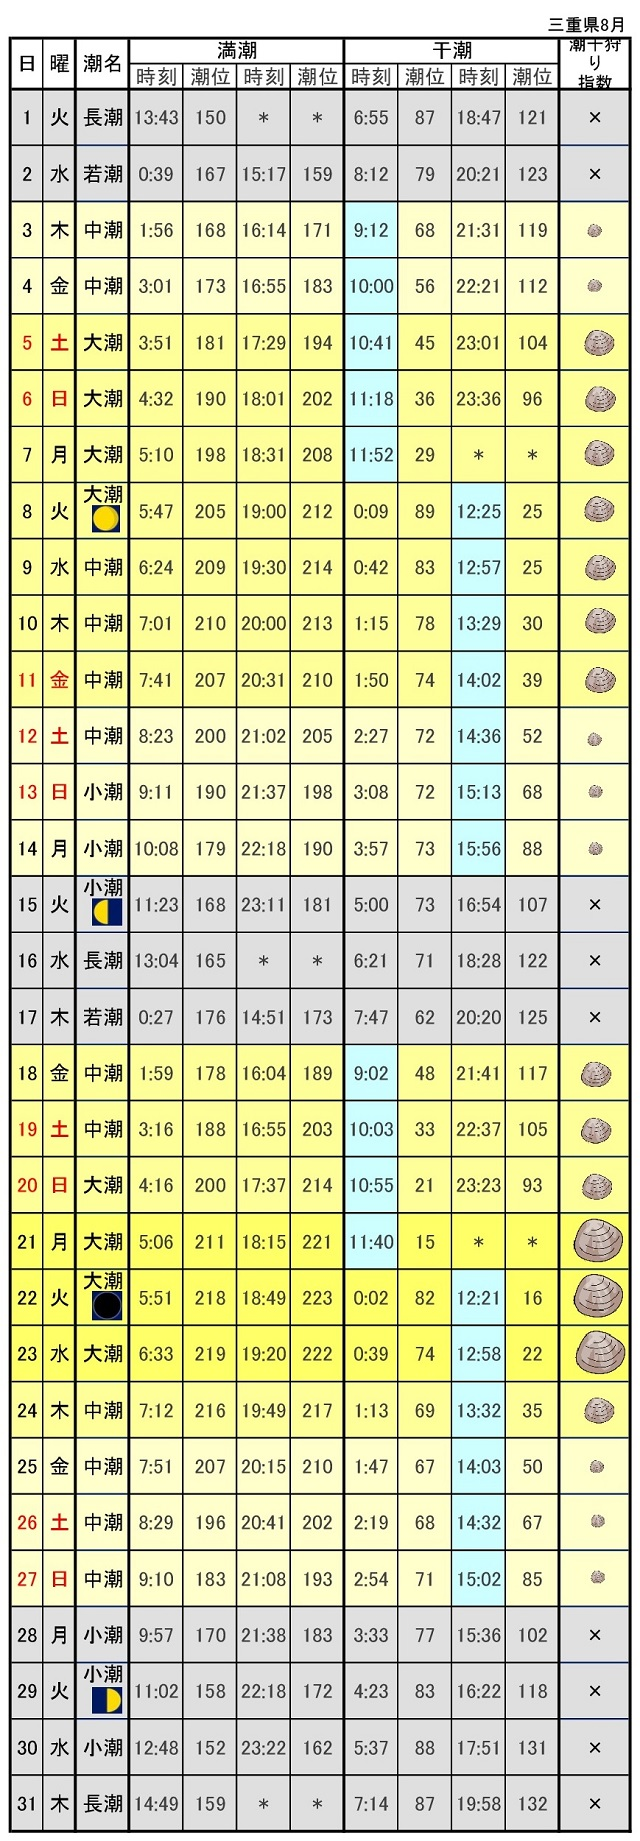 三重県潮汐表潮干狩り2017年8月